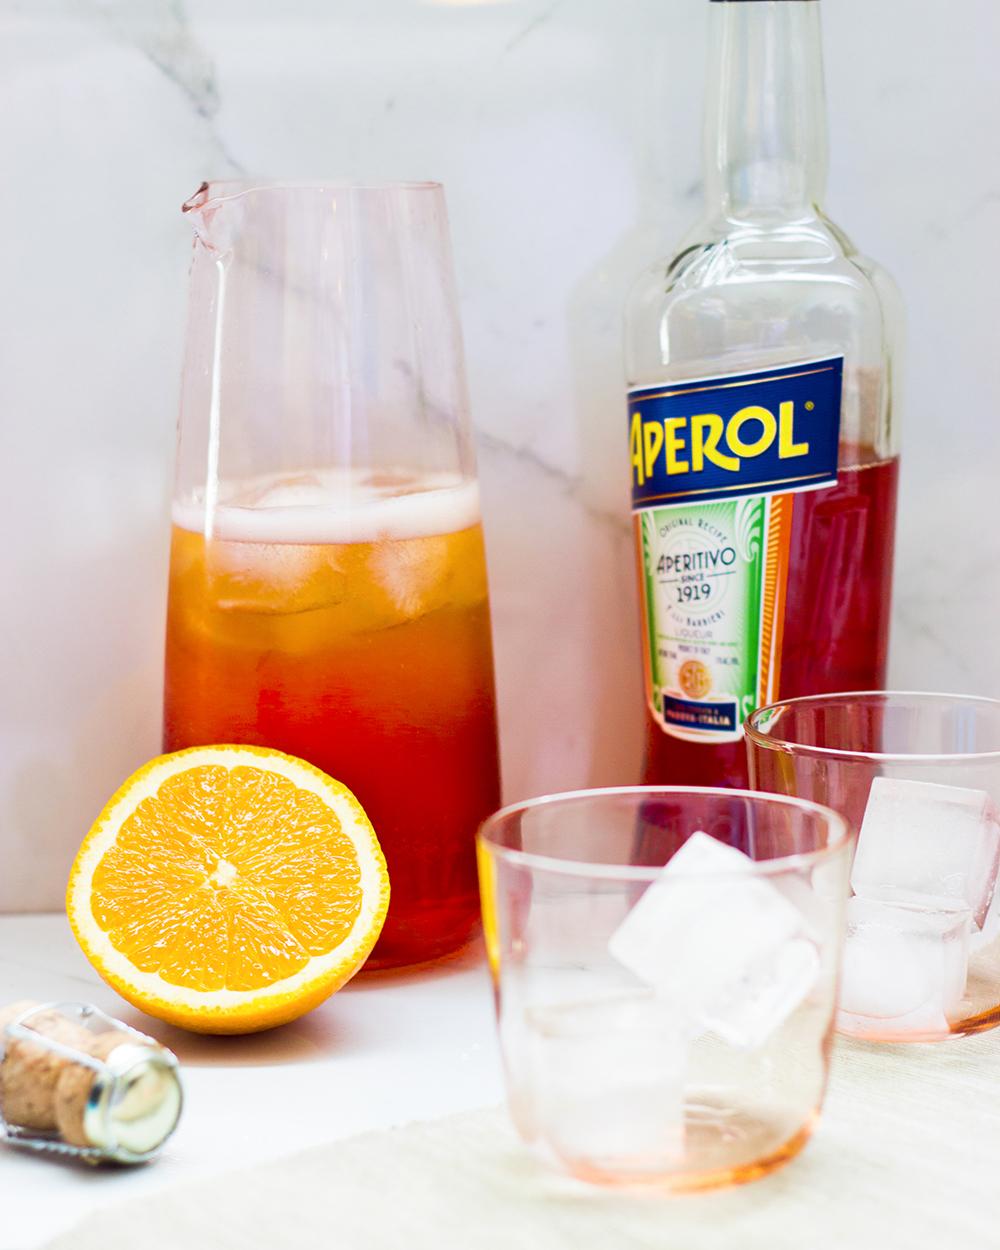 livvyland-blog-aperol-spritz-summer-cocktail-recipe-austin-texas-lifestyle-blogger-3